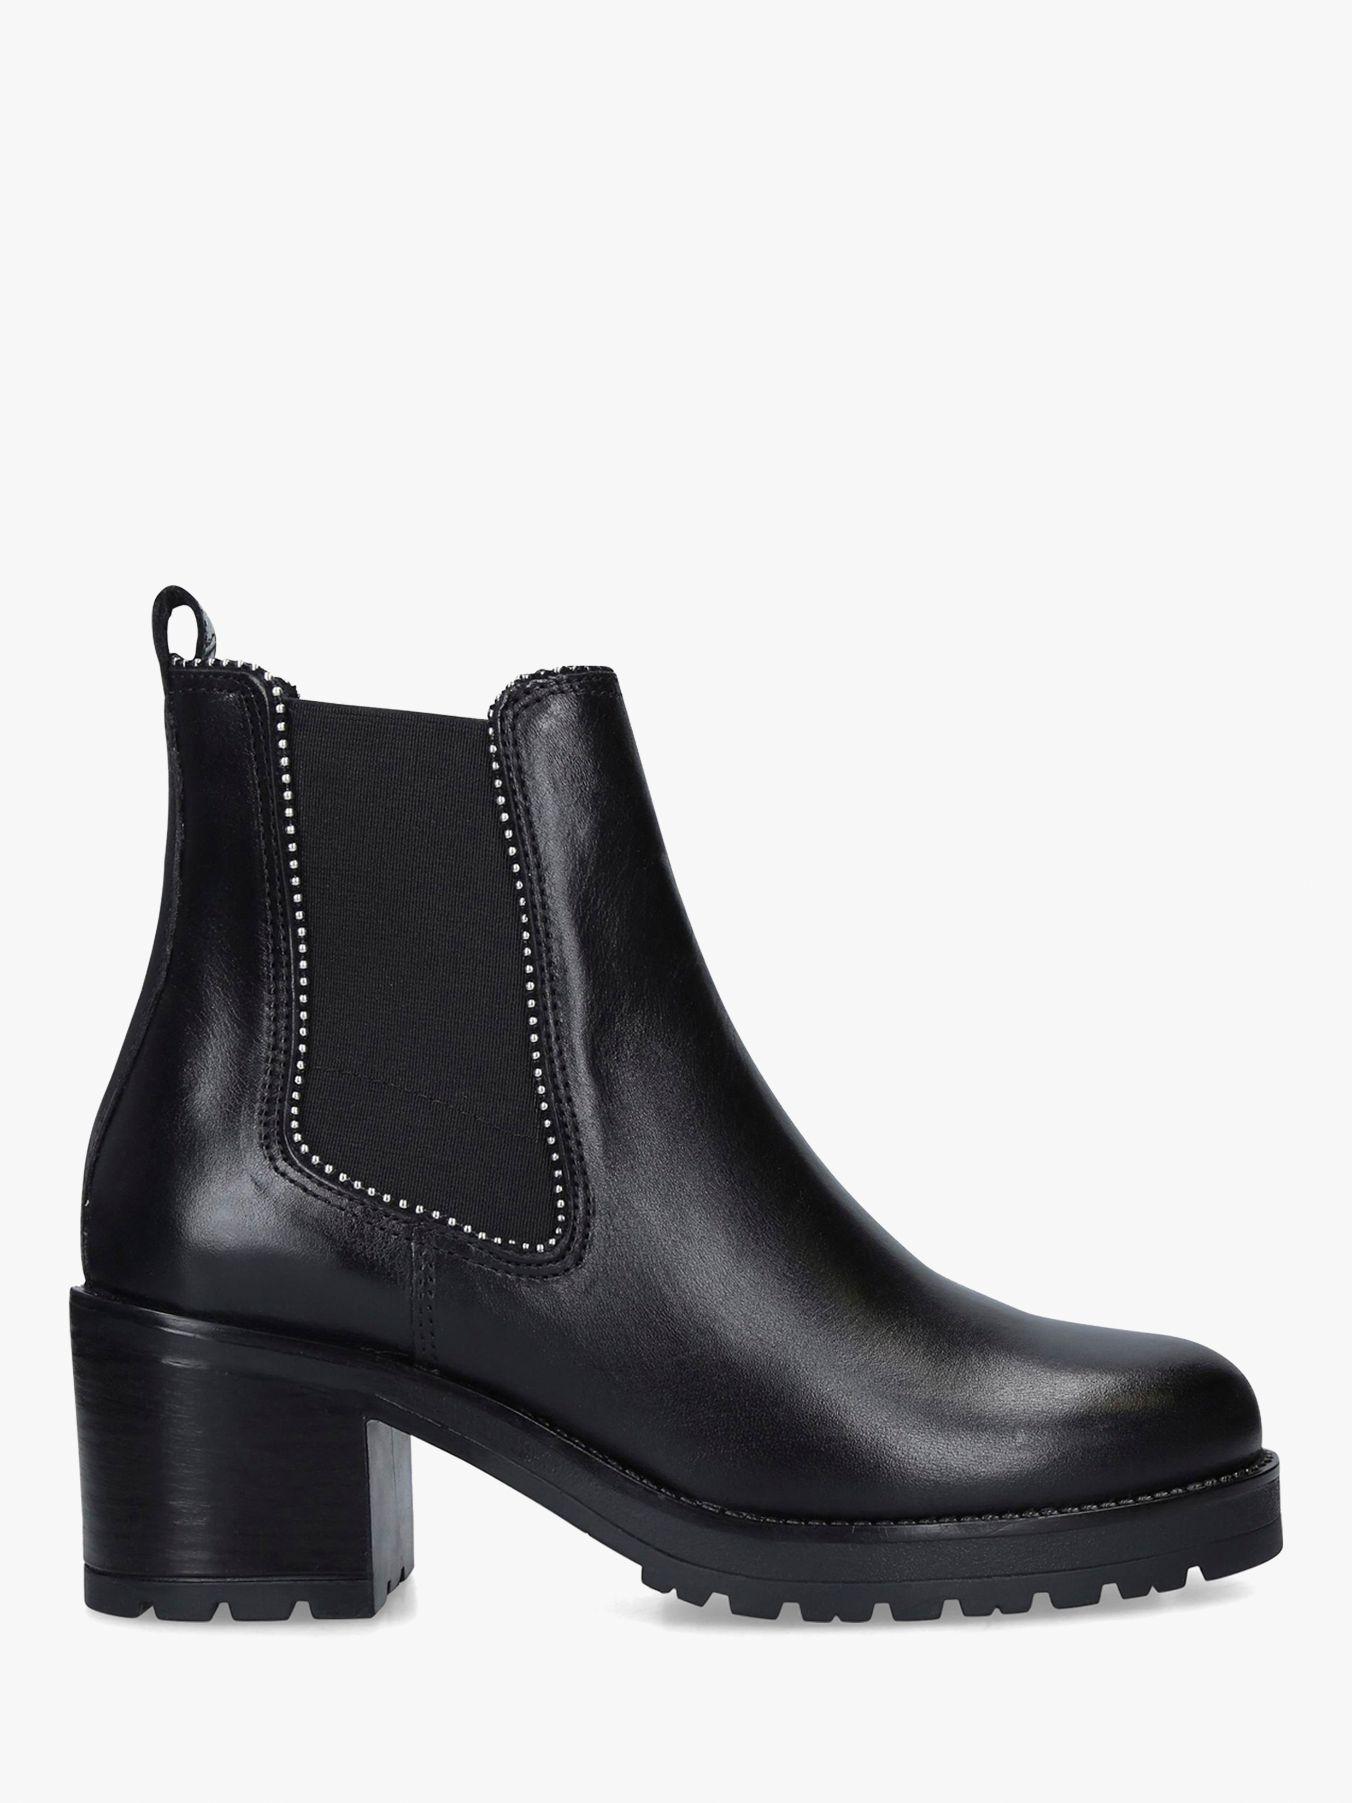 Carvela Carvela Thrill Block Heel Leather Ankle Boots, Black